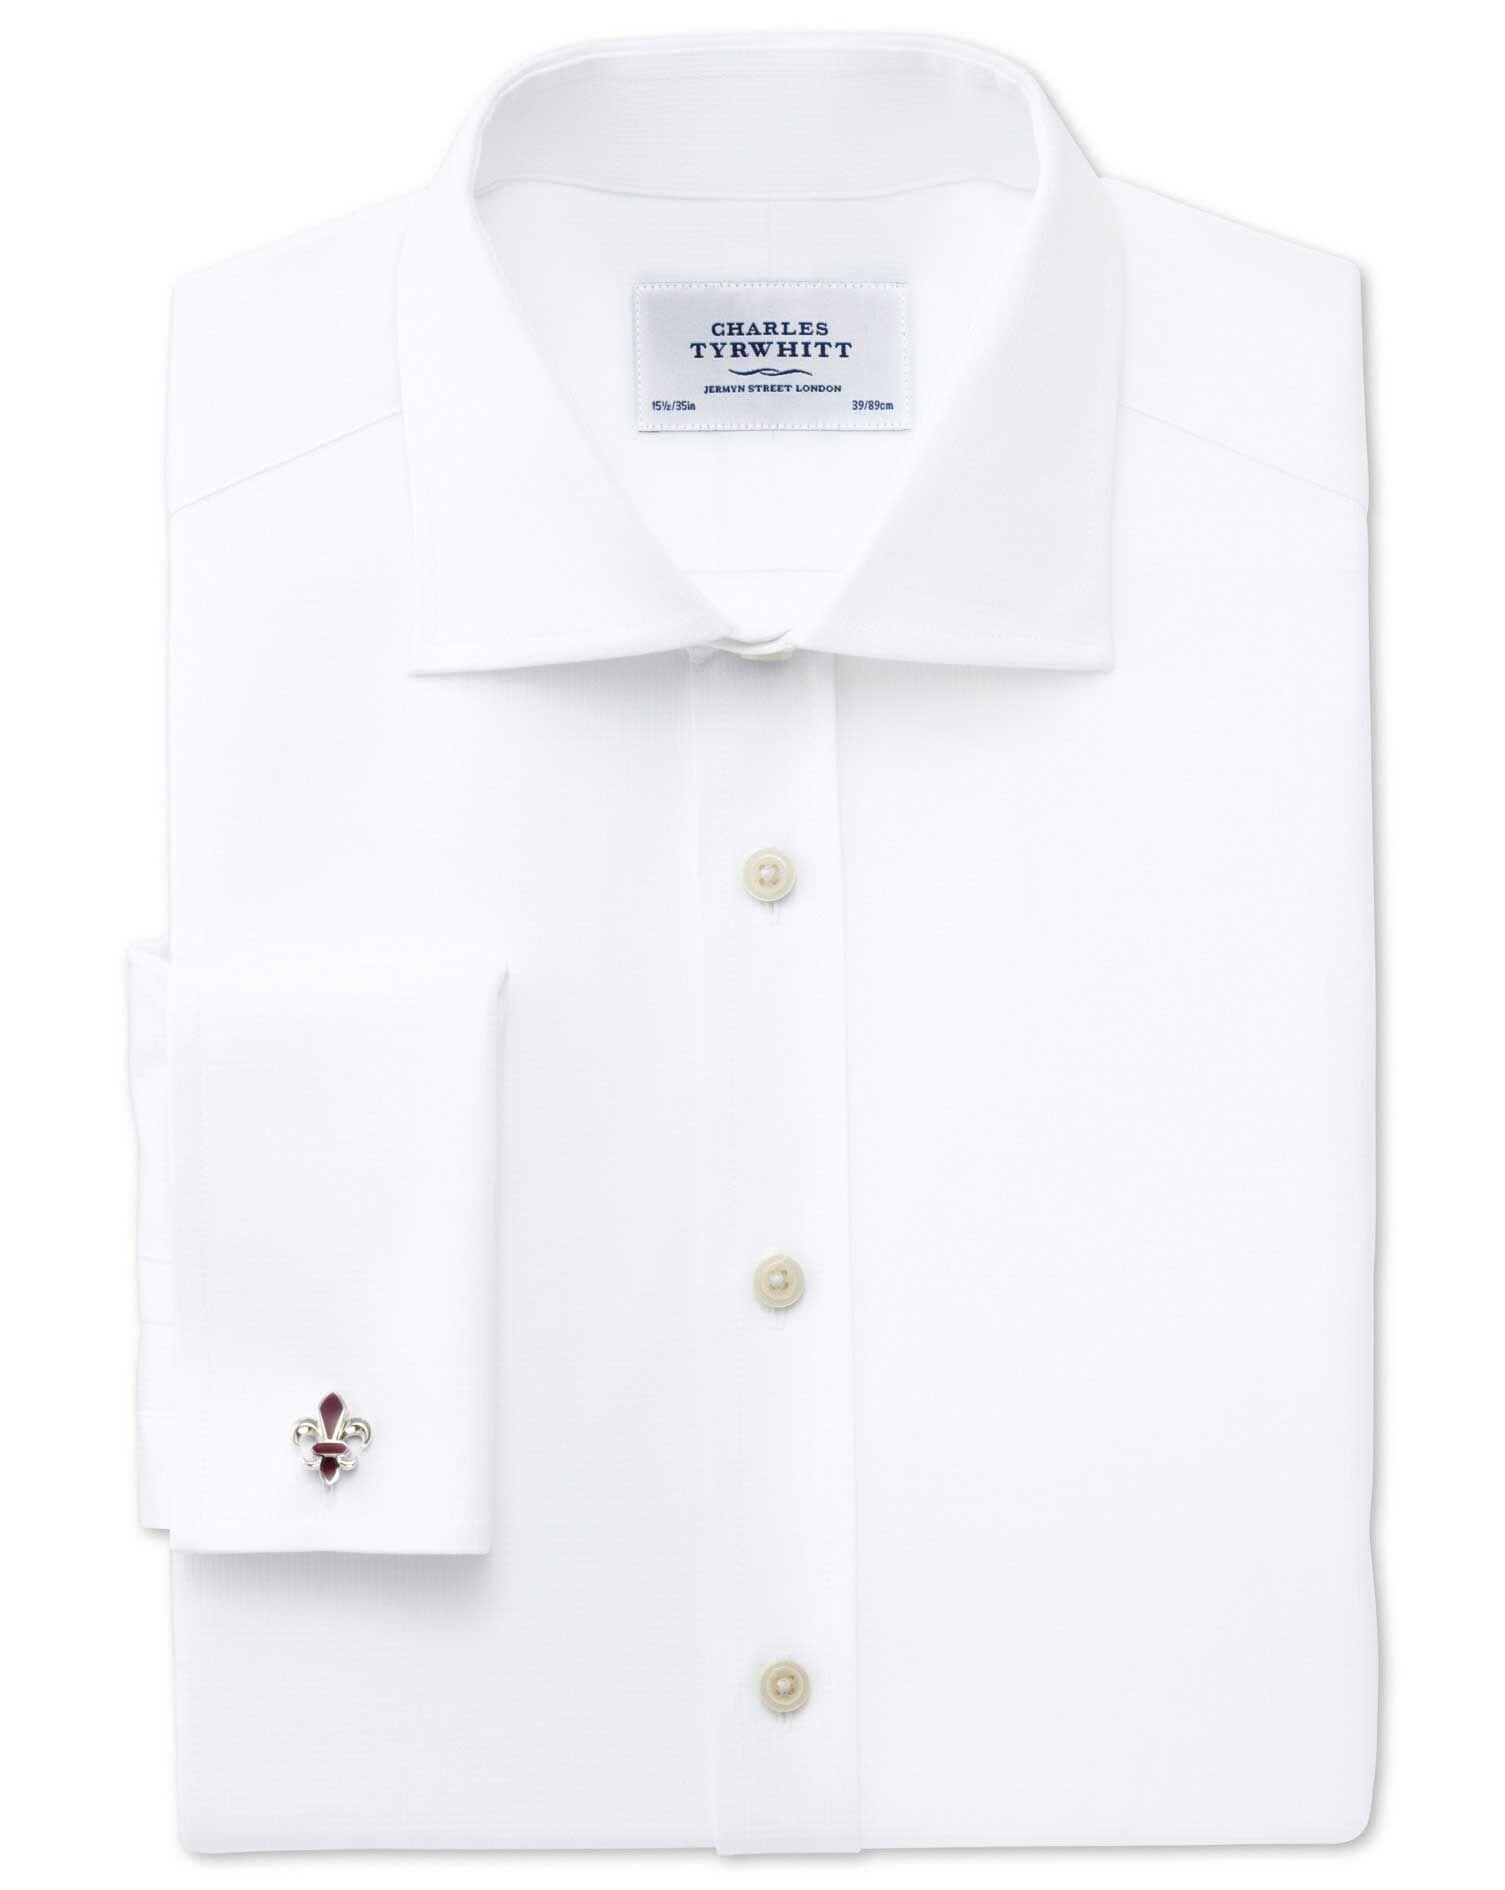 Slim Fit Semi-Cutaway Collar Regency Weave White Egyptian Cotton Formal Shirt Single Cuff Size 15.5/